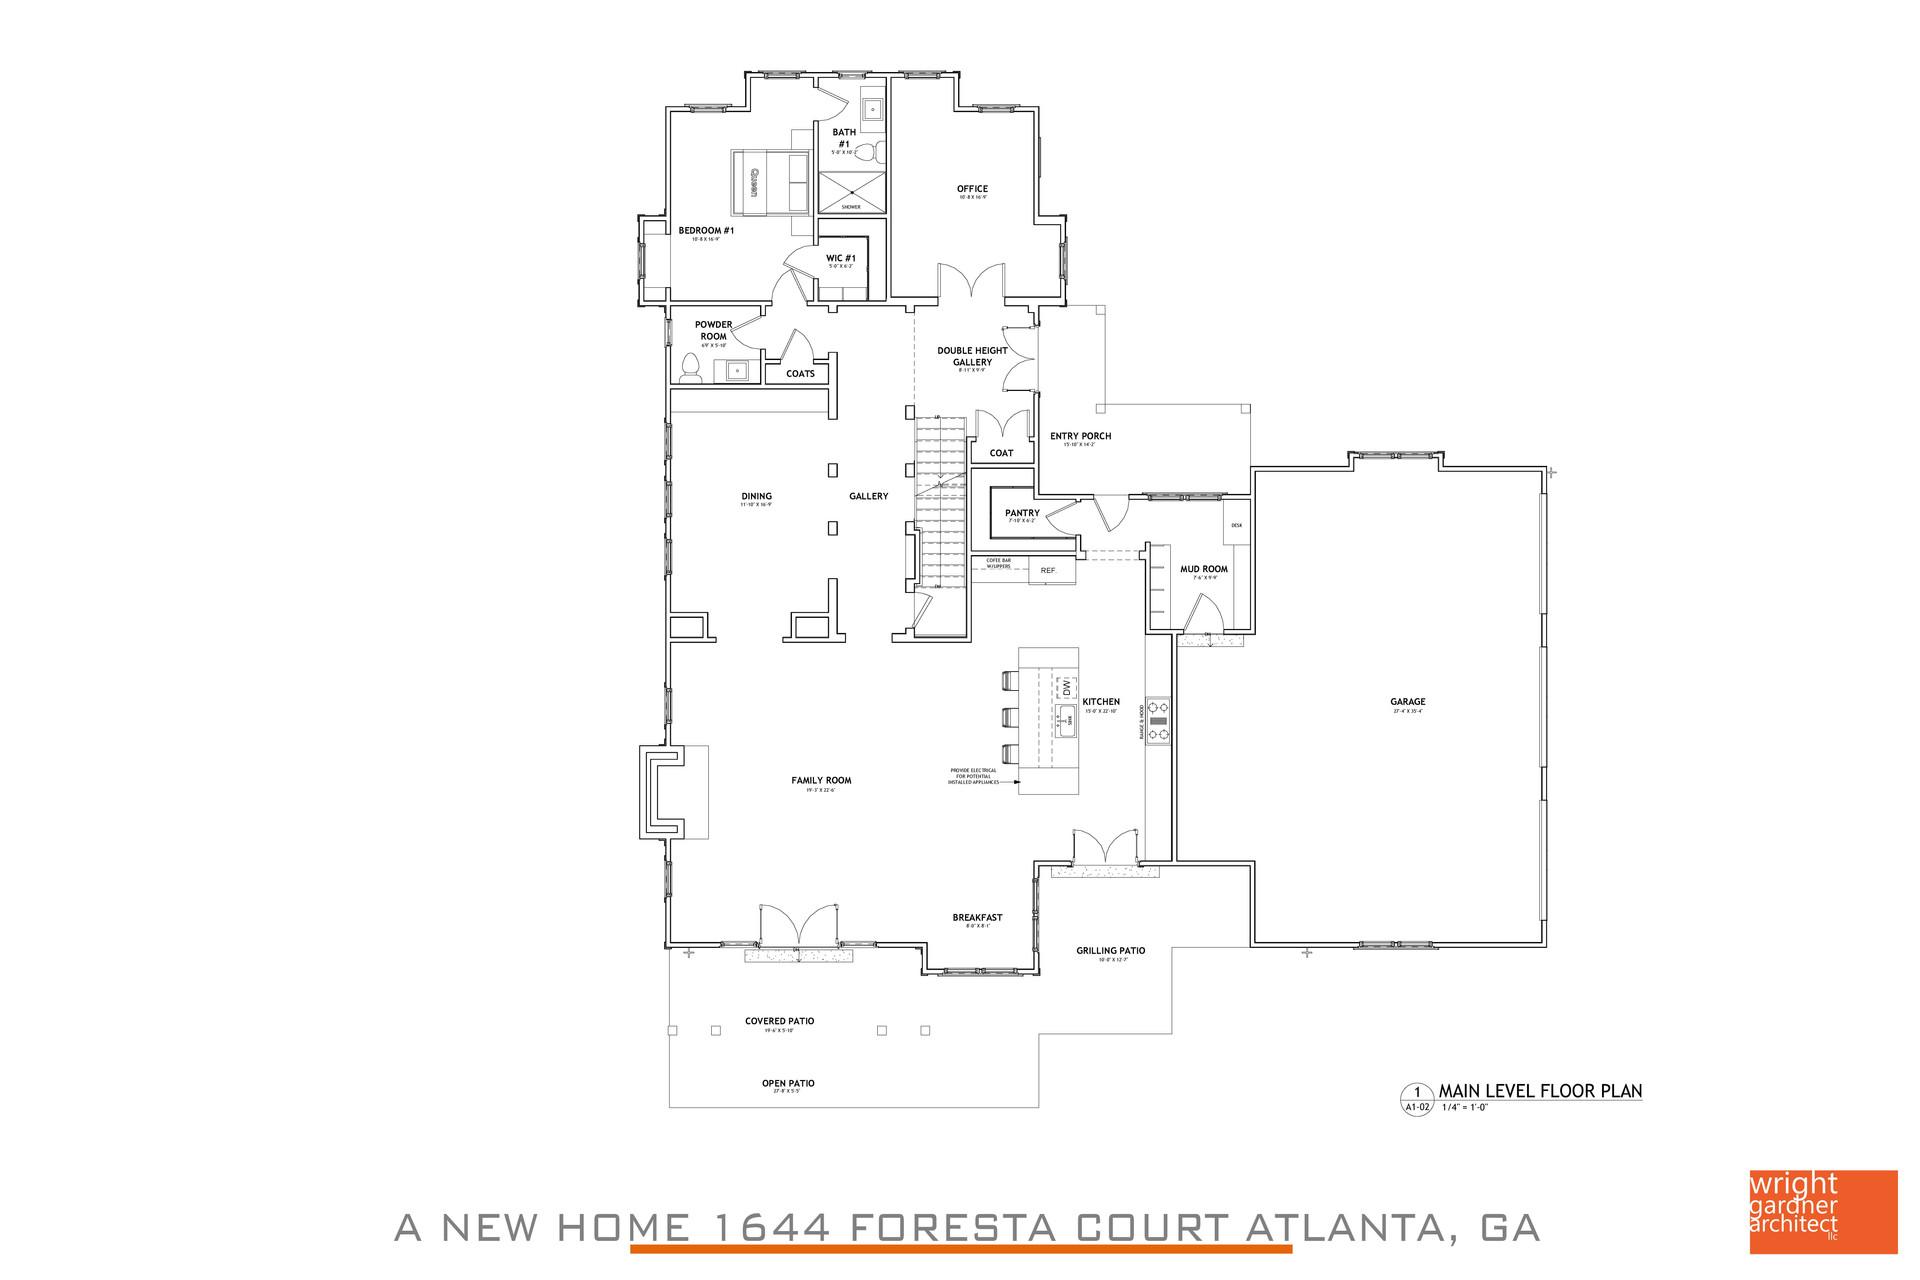 1644 Foresta Park  Plans_Page_2.jpg